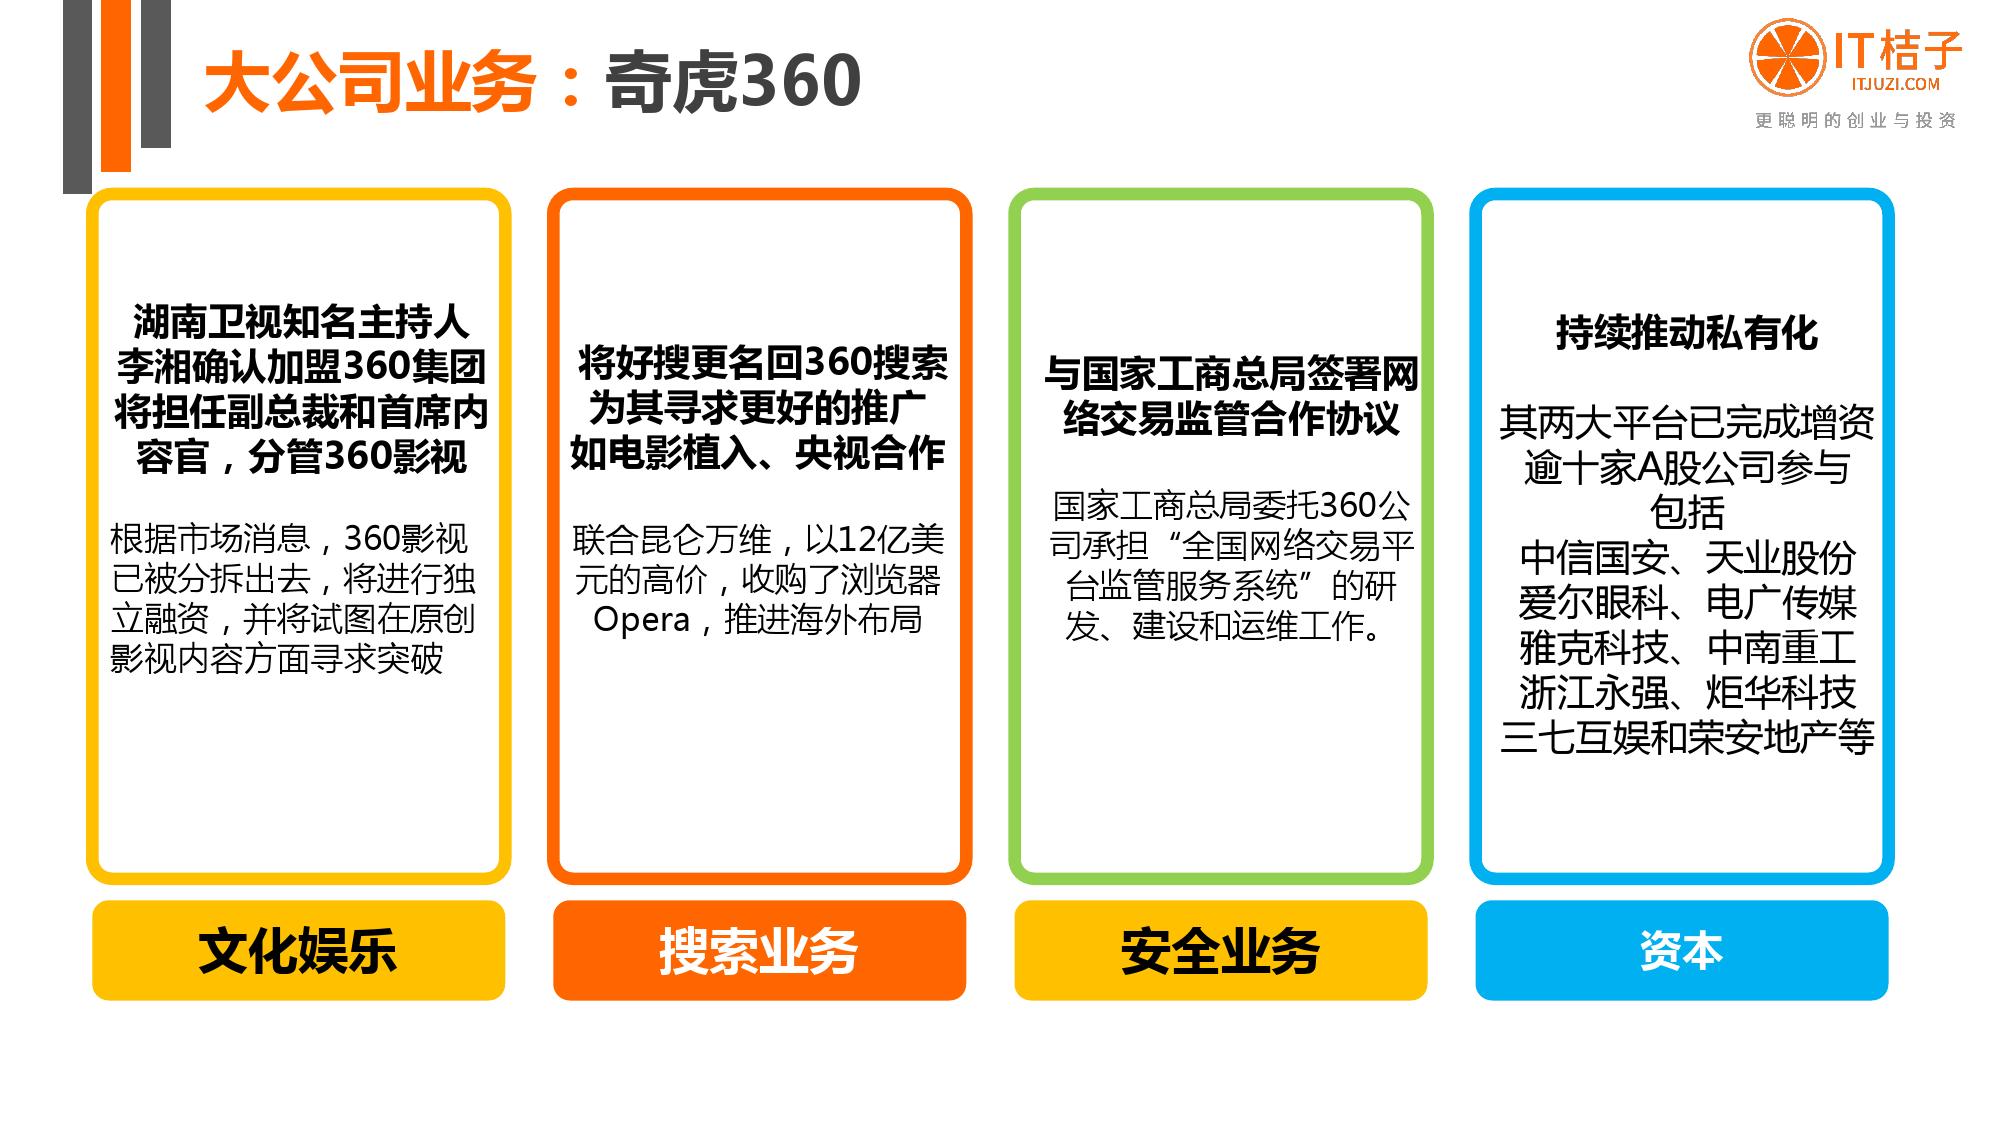 【IT桔子】2016年Q2中国互联网创业投资分析报告_000070